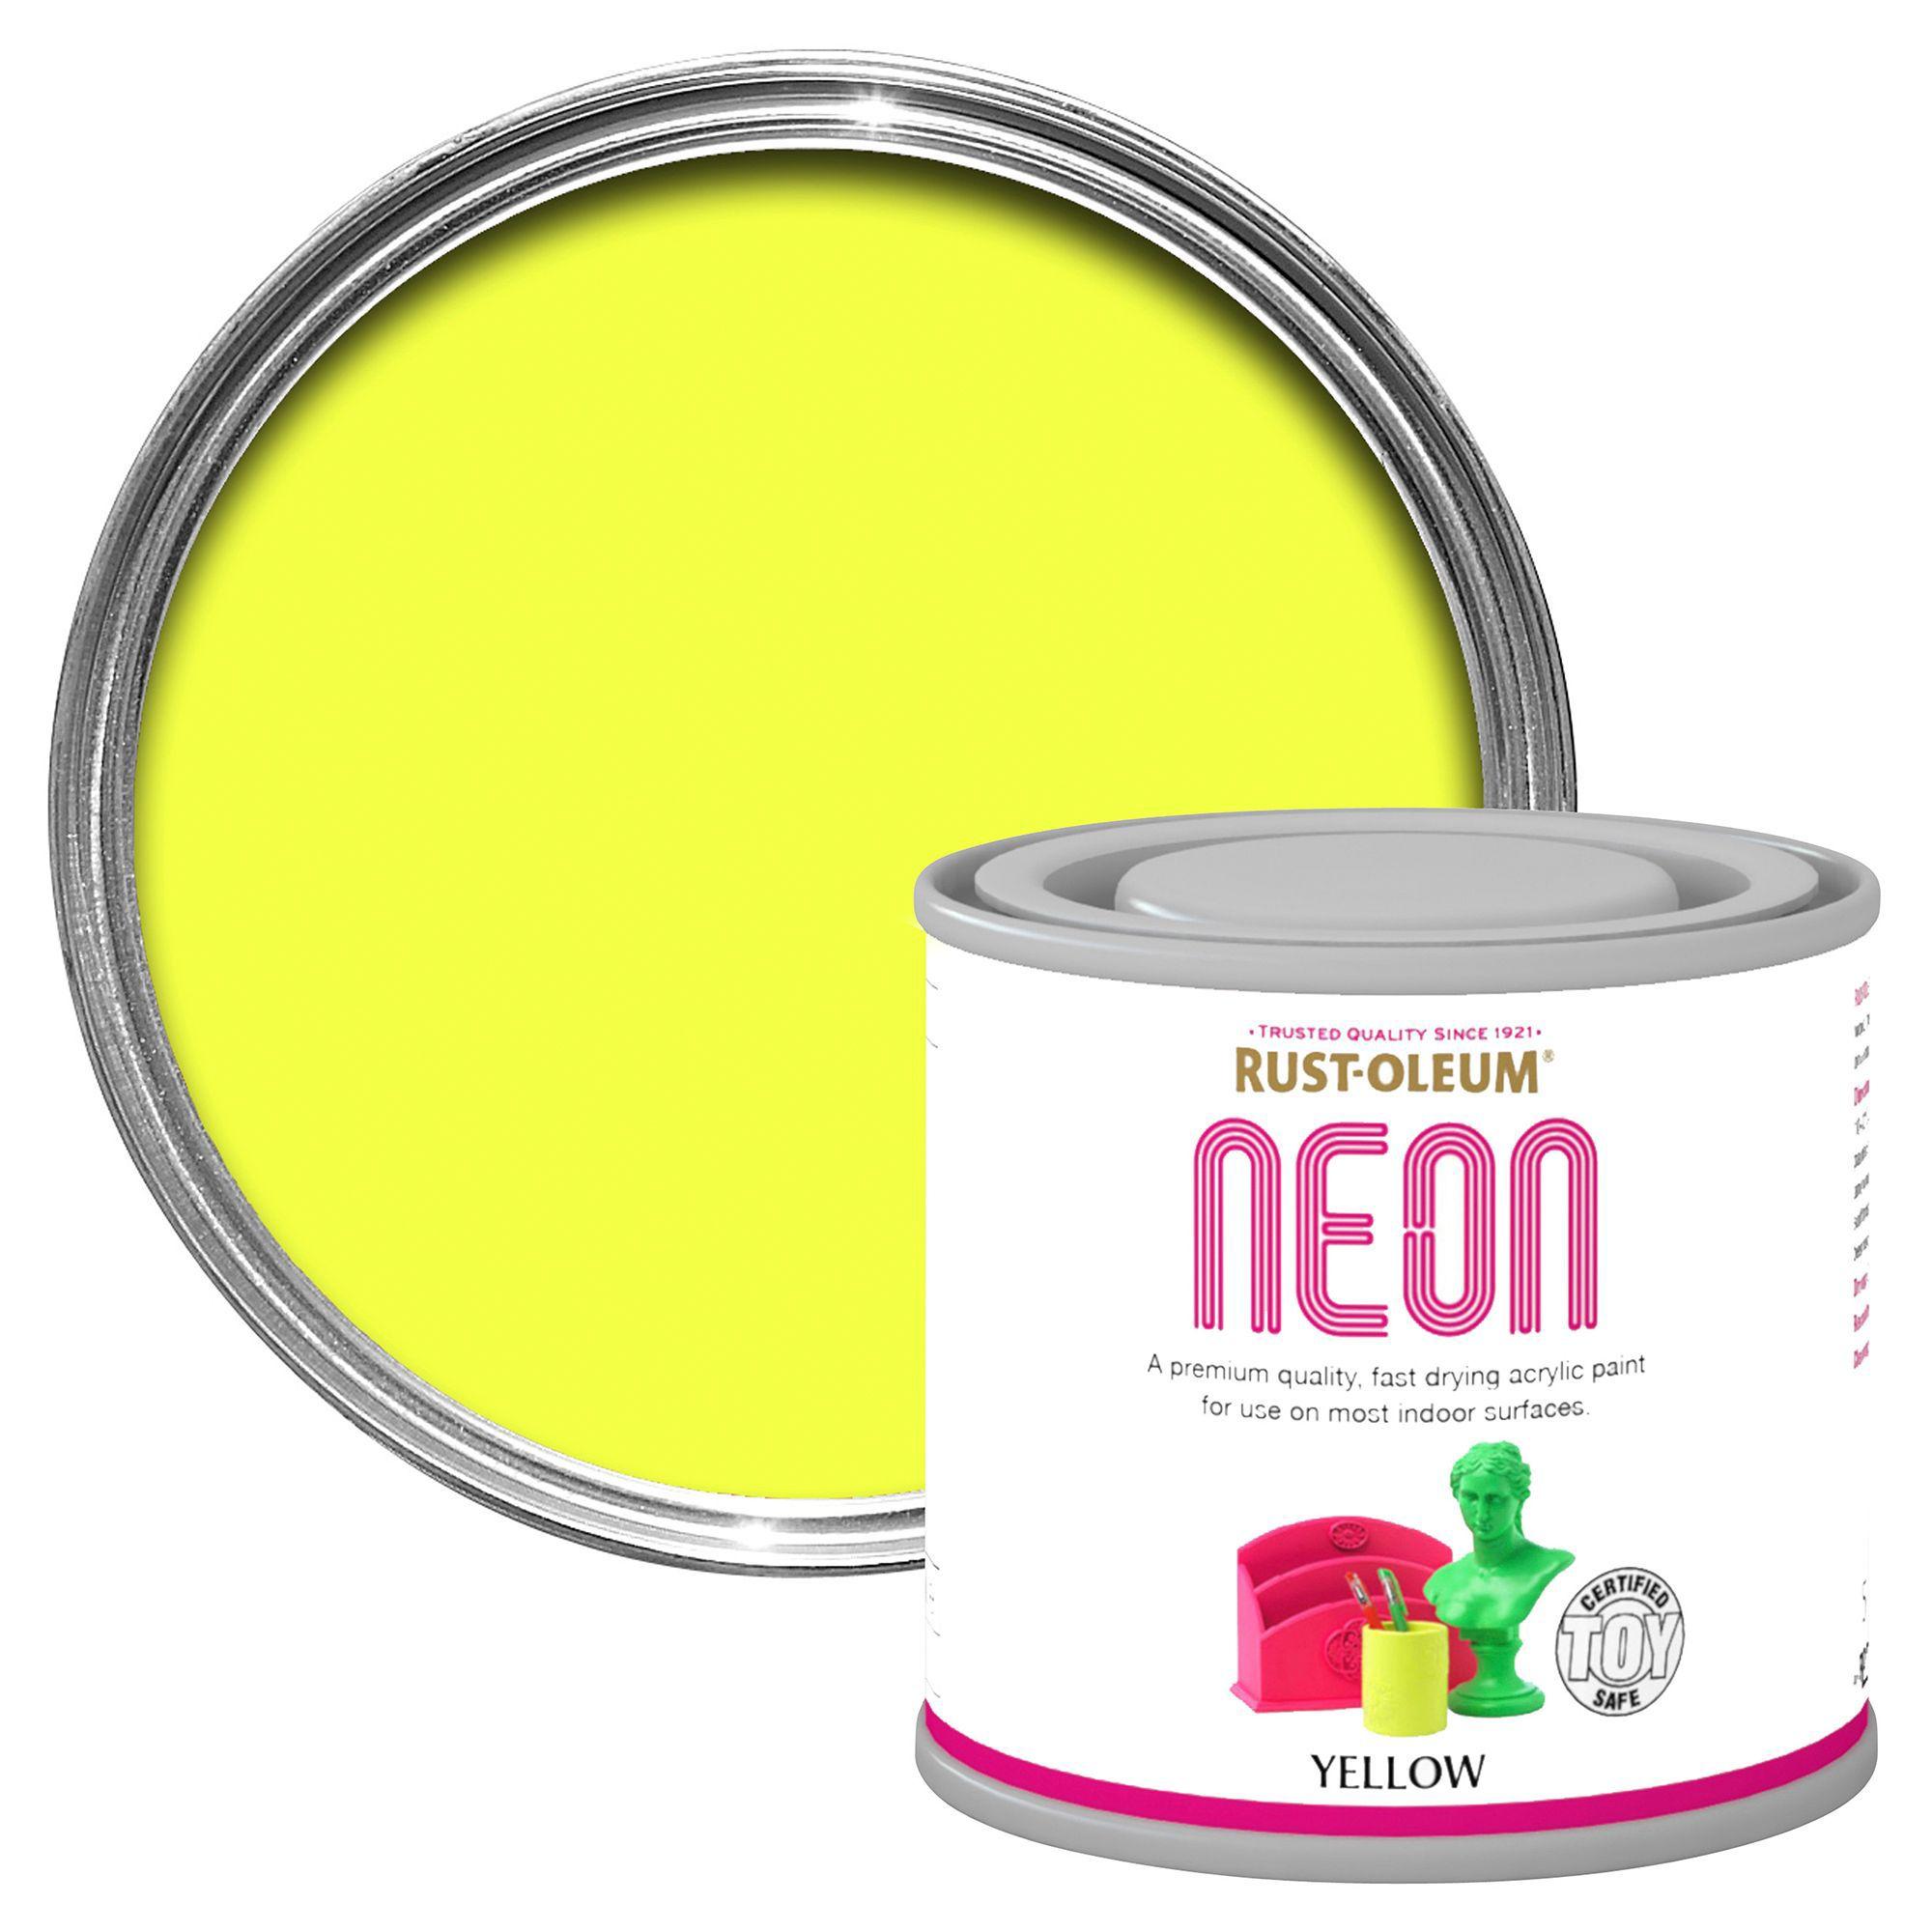 Rust-Oleum Yellow Neon Paint 125ml